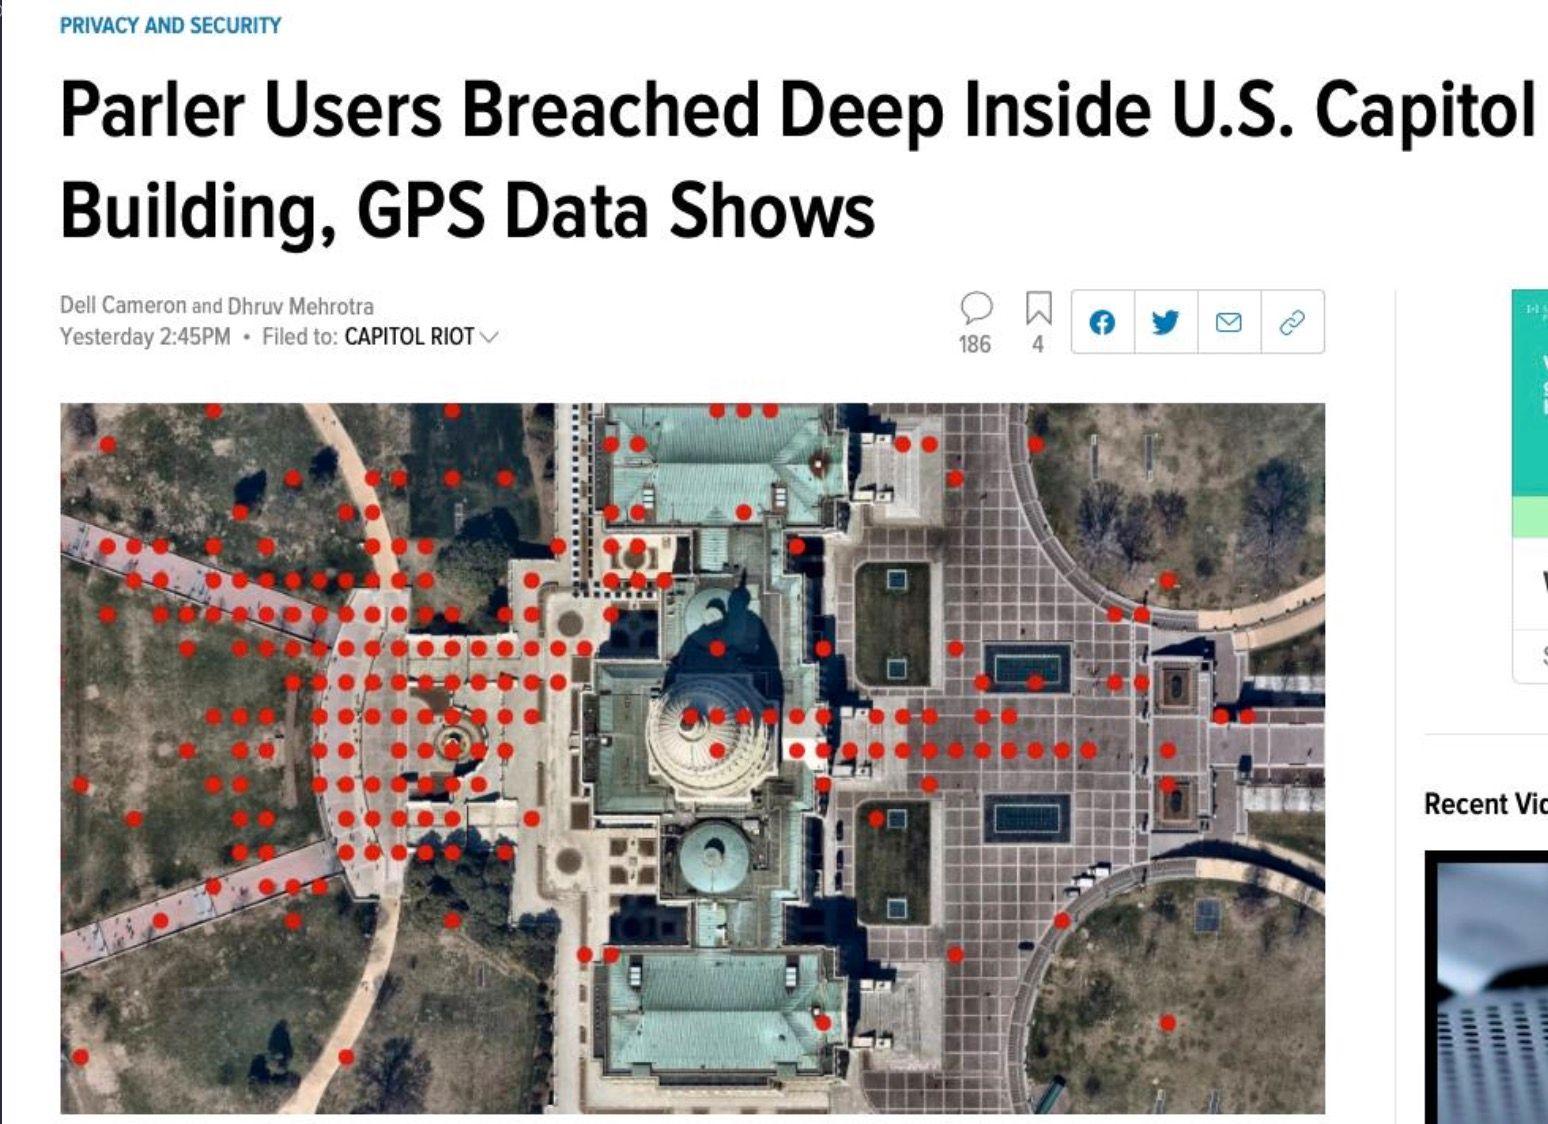 U.S. Capitol Building, GPS Data